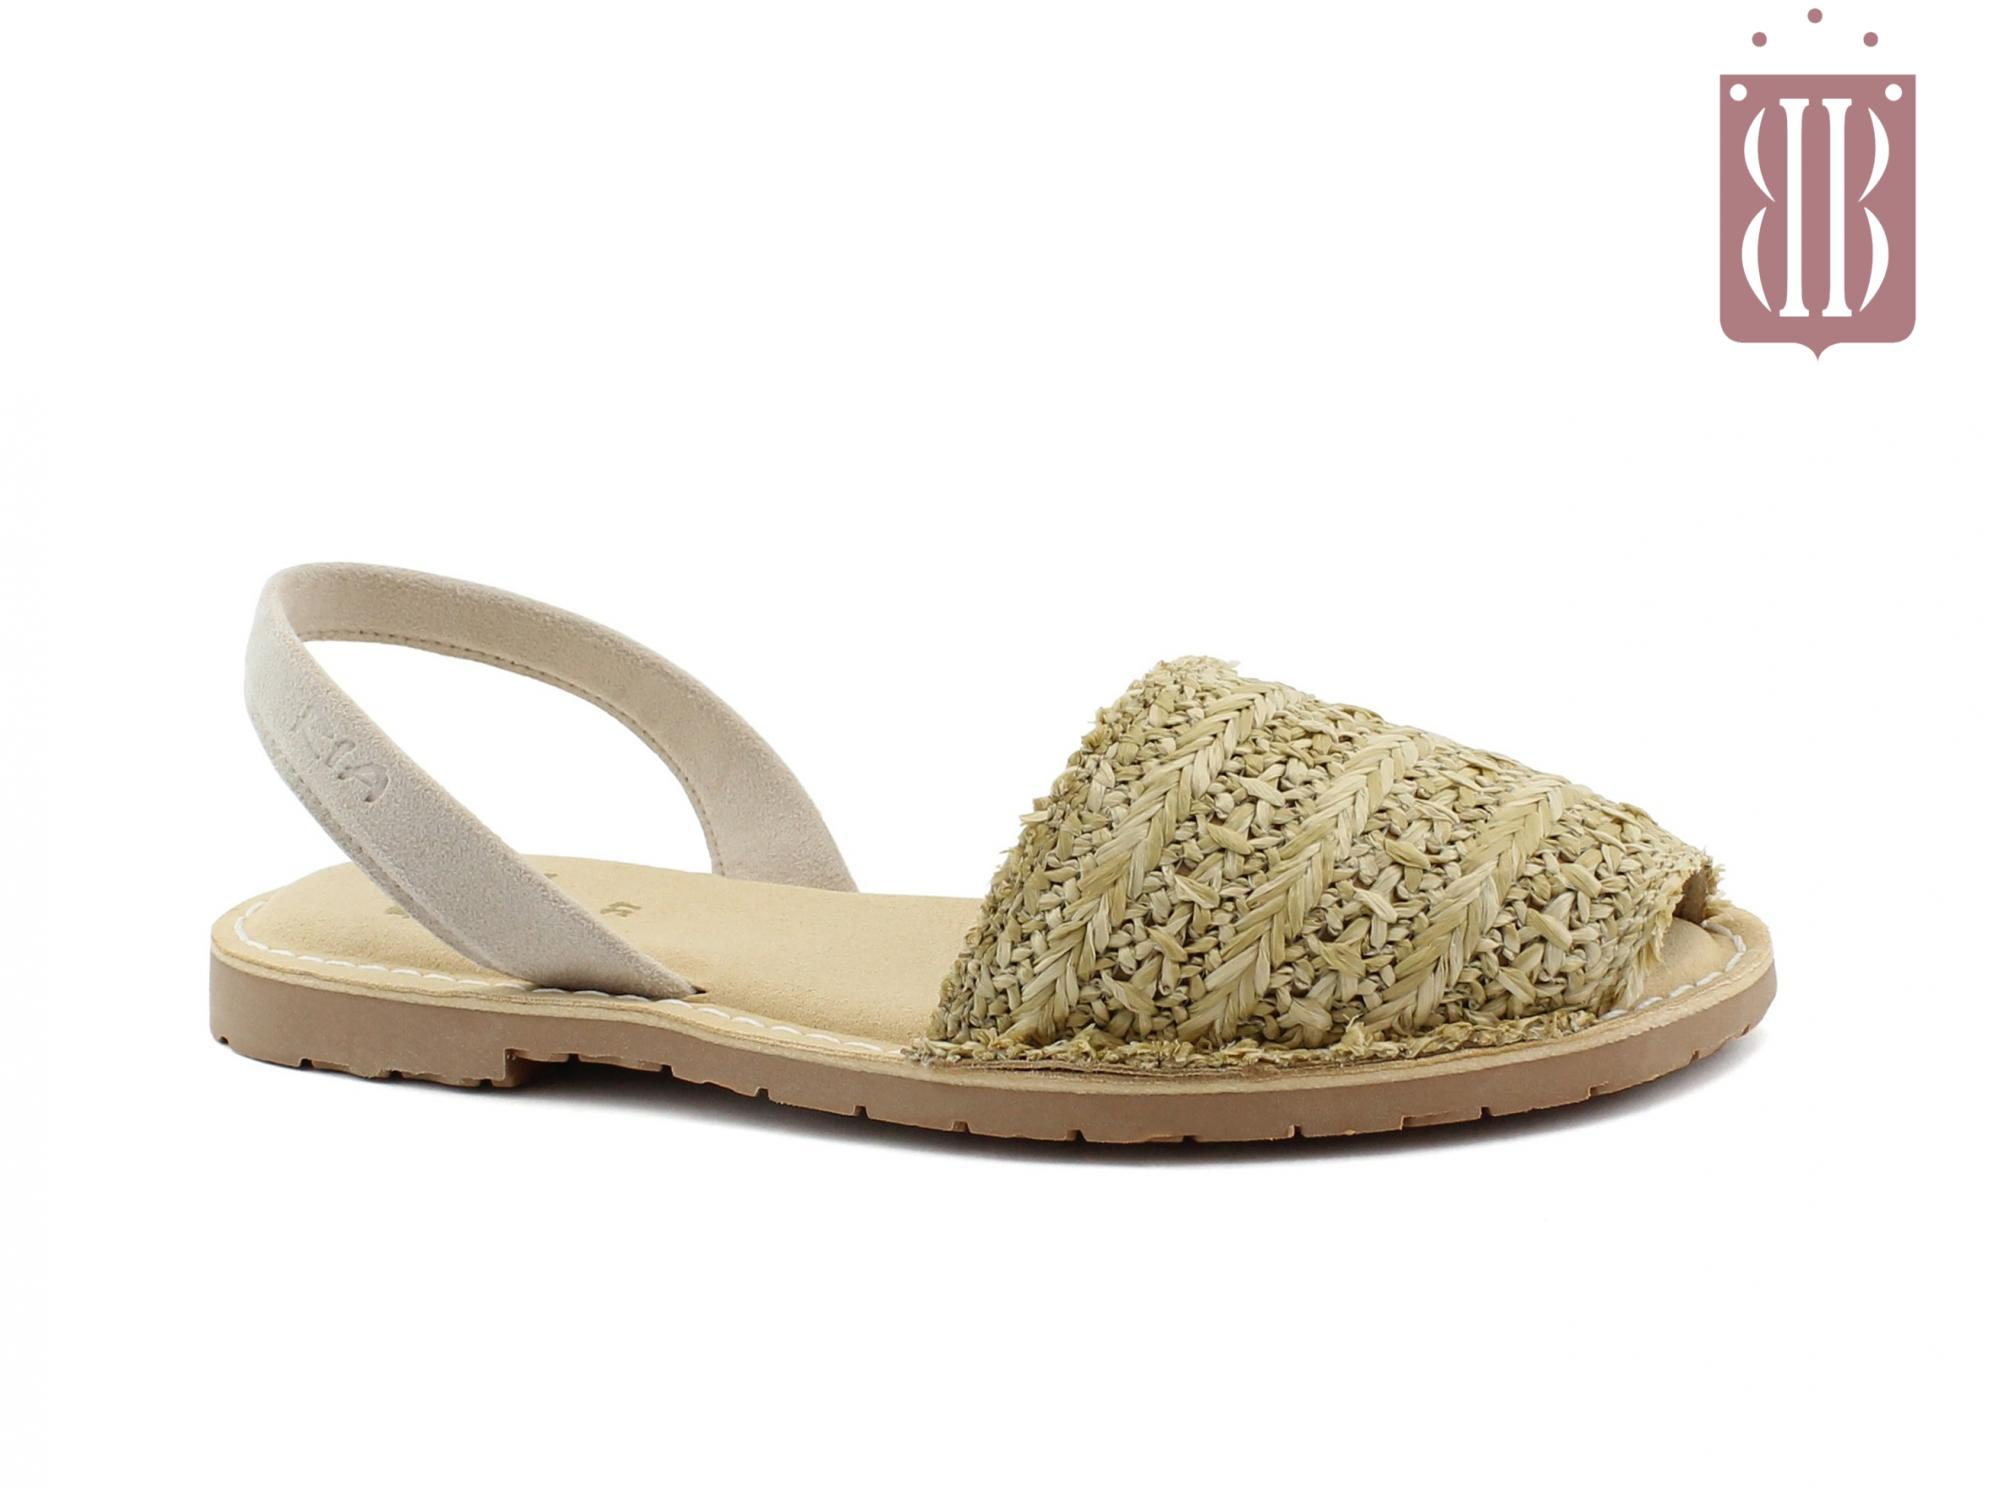 new product 72b20 c1ceb RIA scarpe donna sandali minorchine sottopiede imbottito vegan shoes